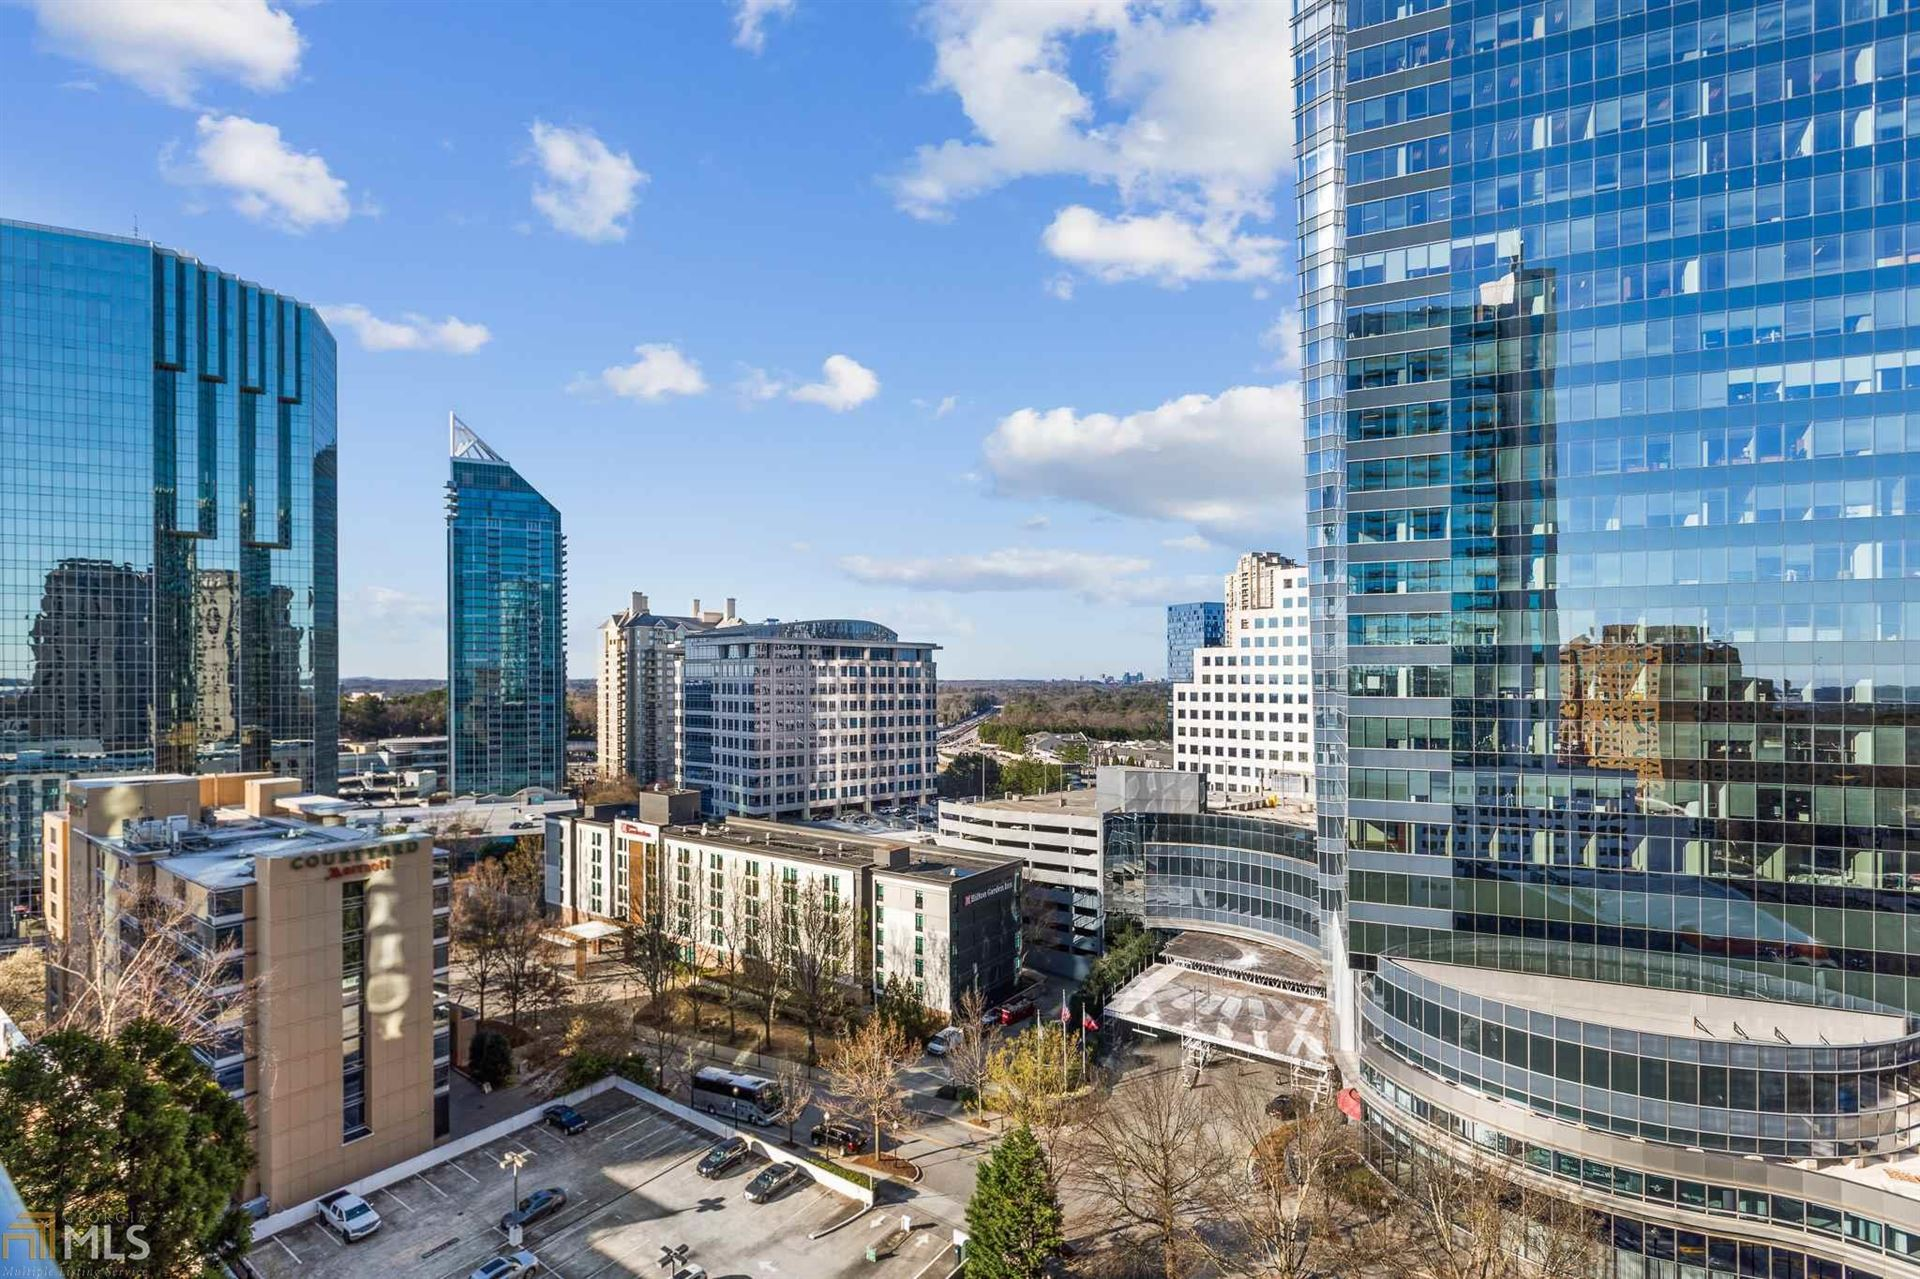 3324 Peachtree Rd, Atlanta, GA 30326 - MLS#: 8761017